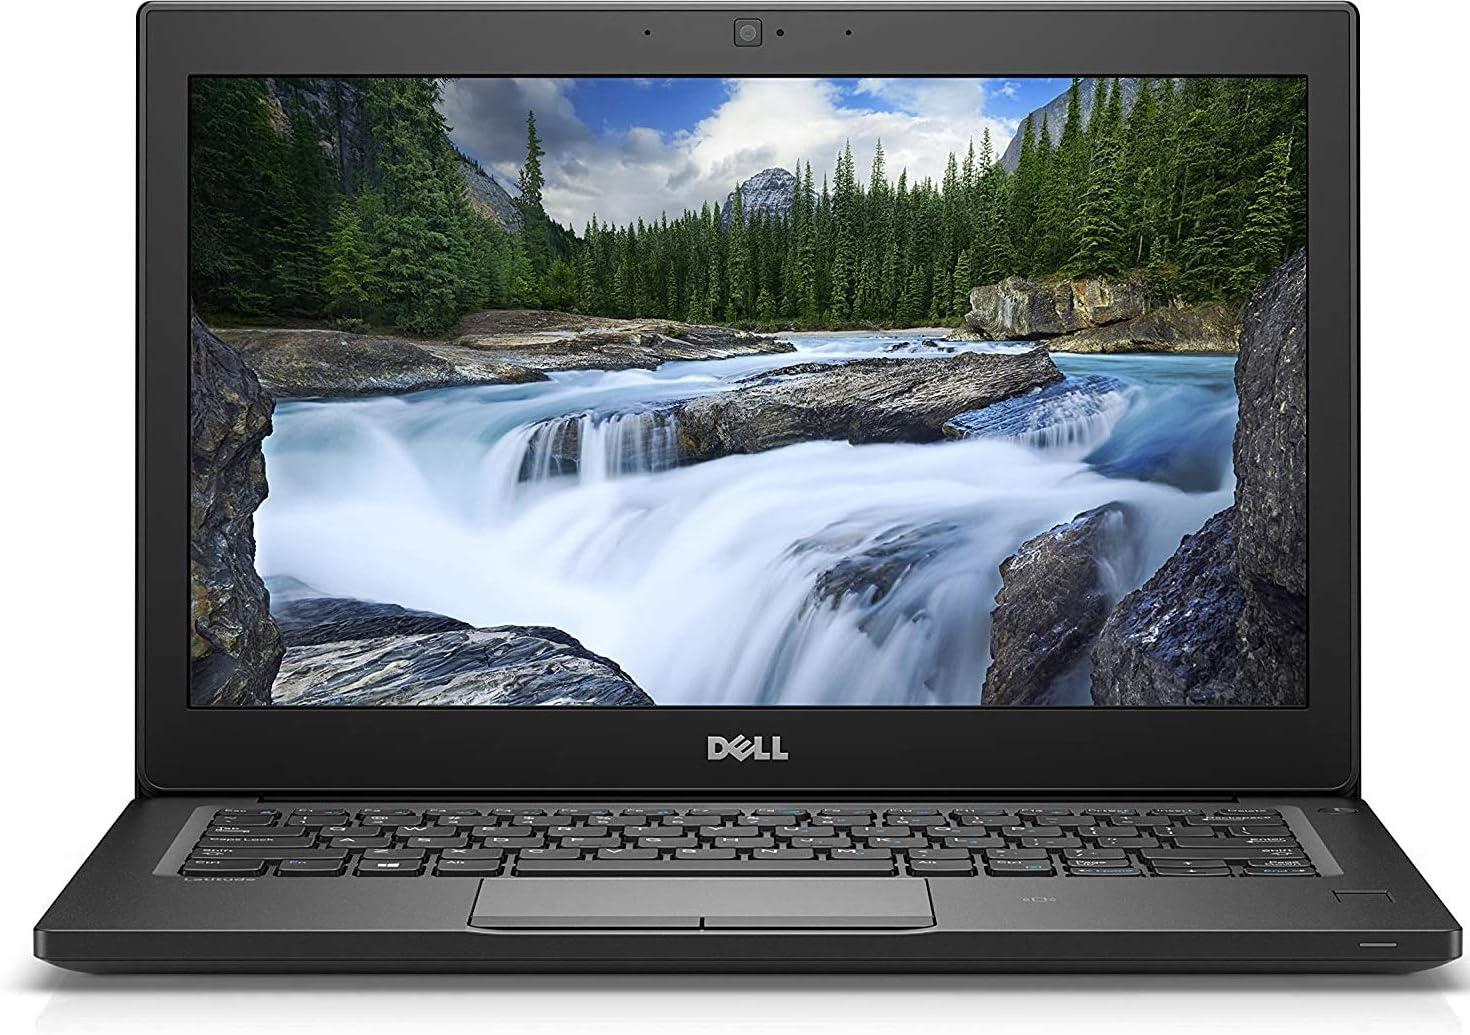 "Dell Latitude 7290 12.5"" HD Business Laptop, Intel Core i5-8350U, 256GB SSD, 16GB DDR4, Webcam, Bluetooth, Windows 10 Pro (Renewed)"